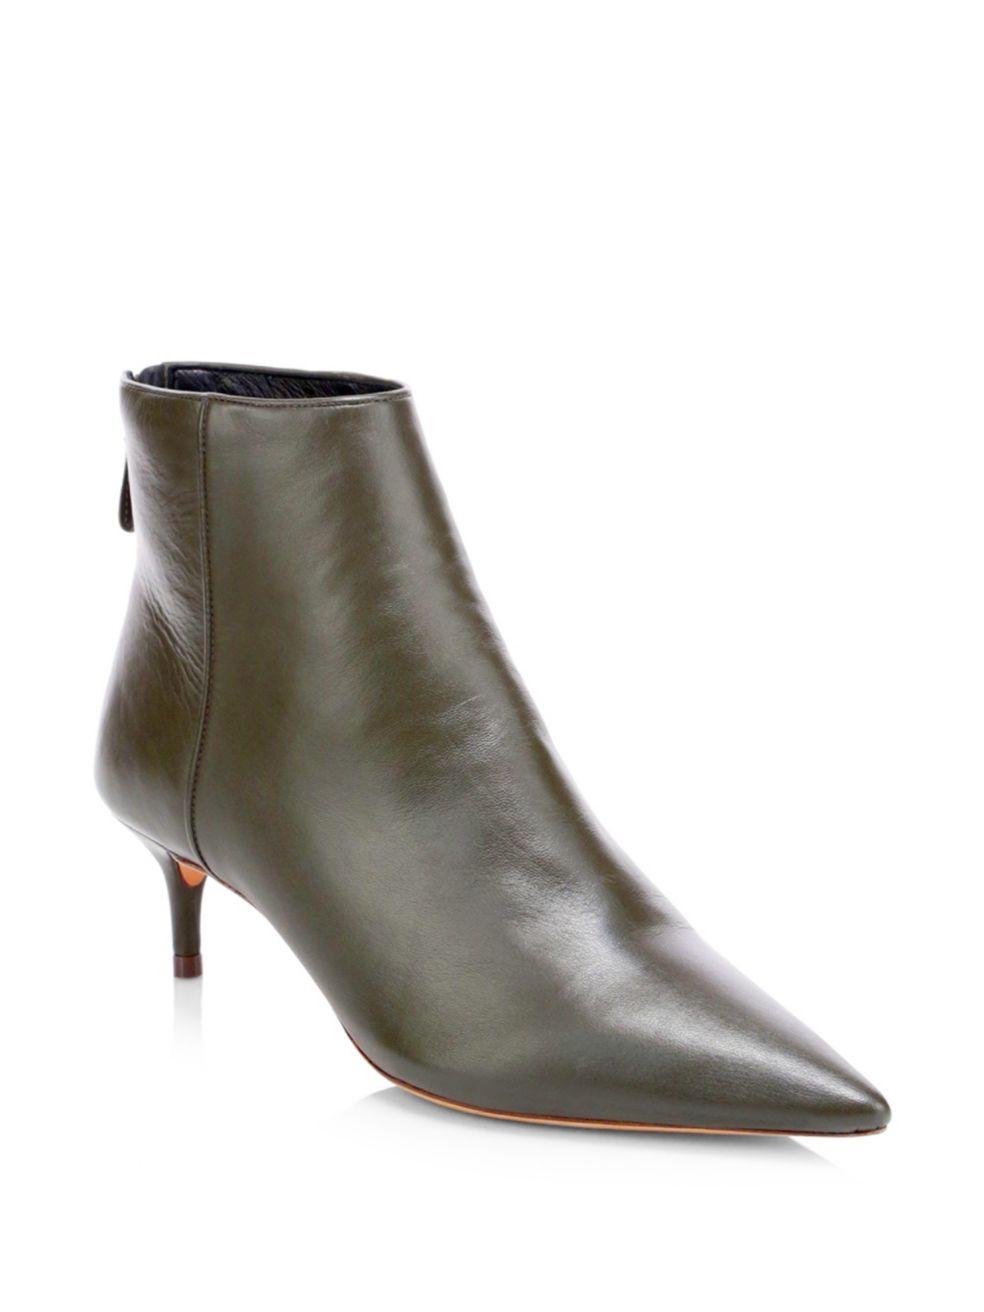 235420c3d5 Alexandre Birman - Leather Kitten Heel Booties - Green | FASHION ...